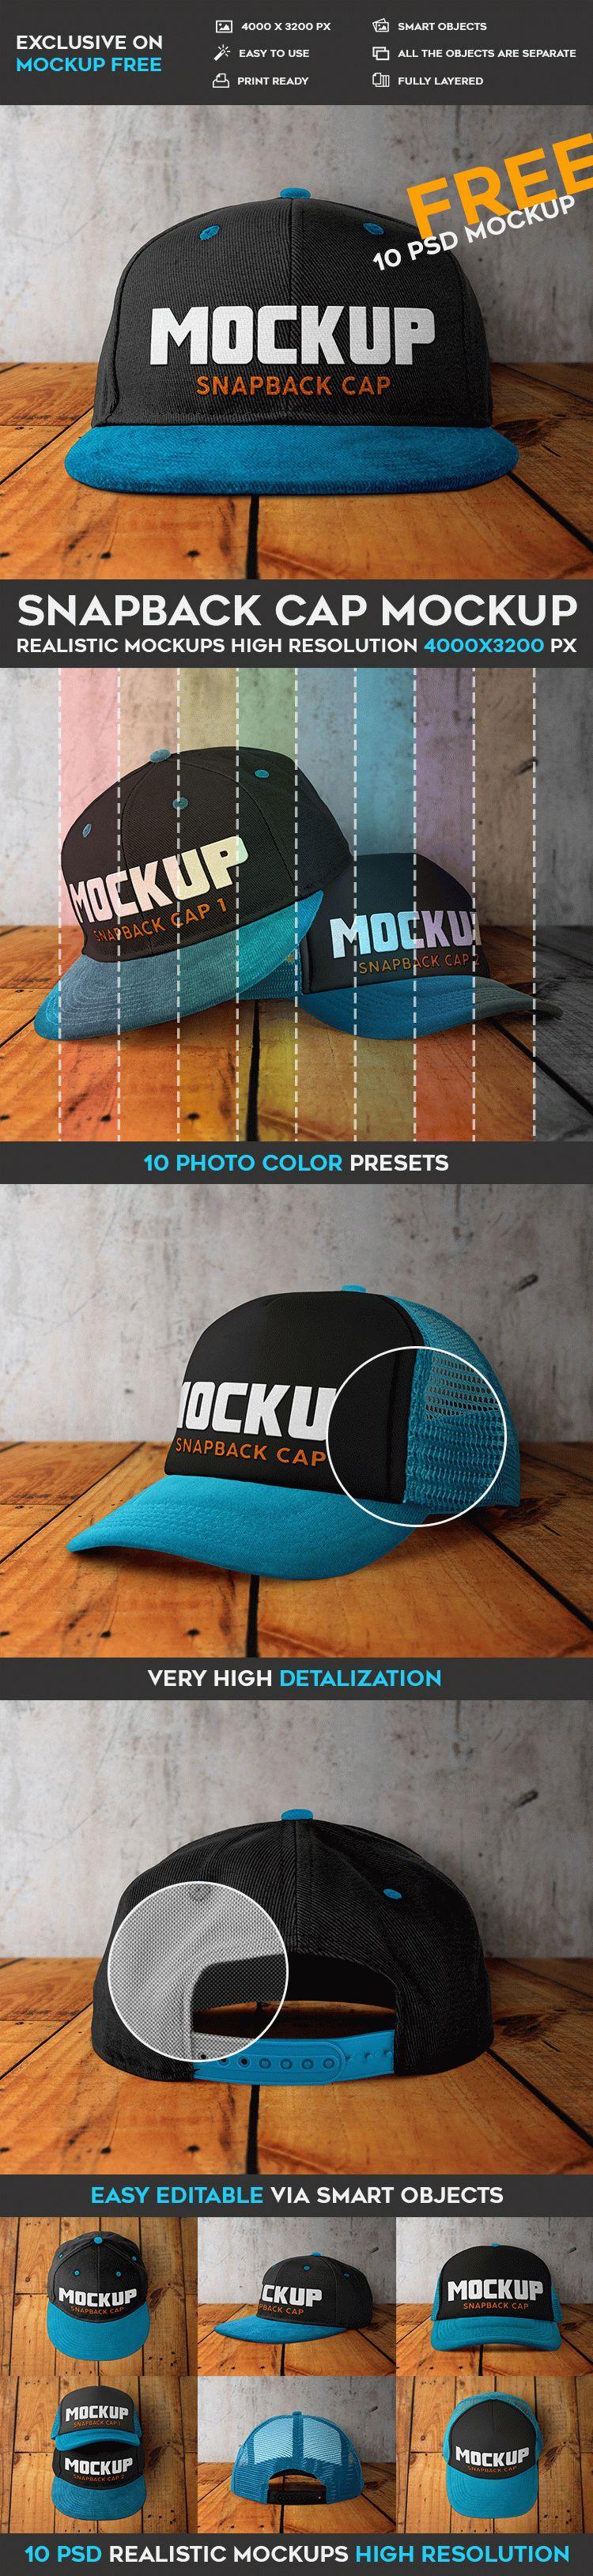 Snapback Cap - 10 Free PSD Mockups